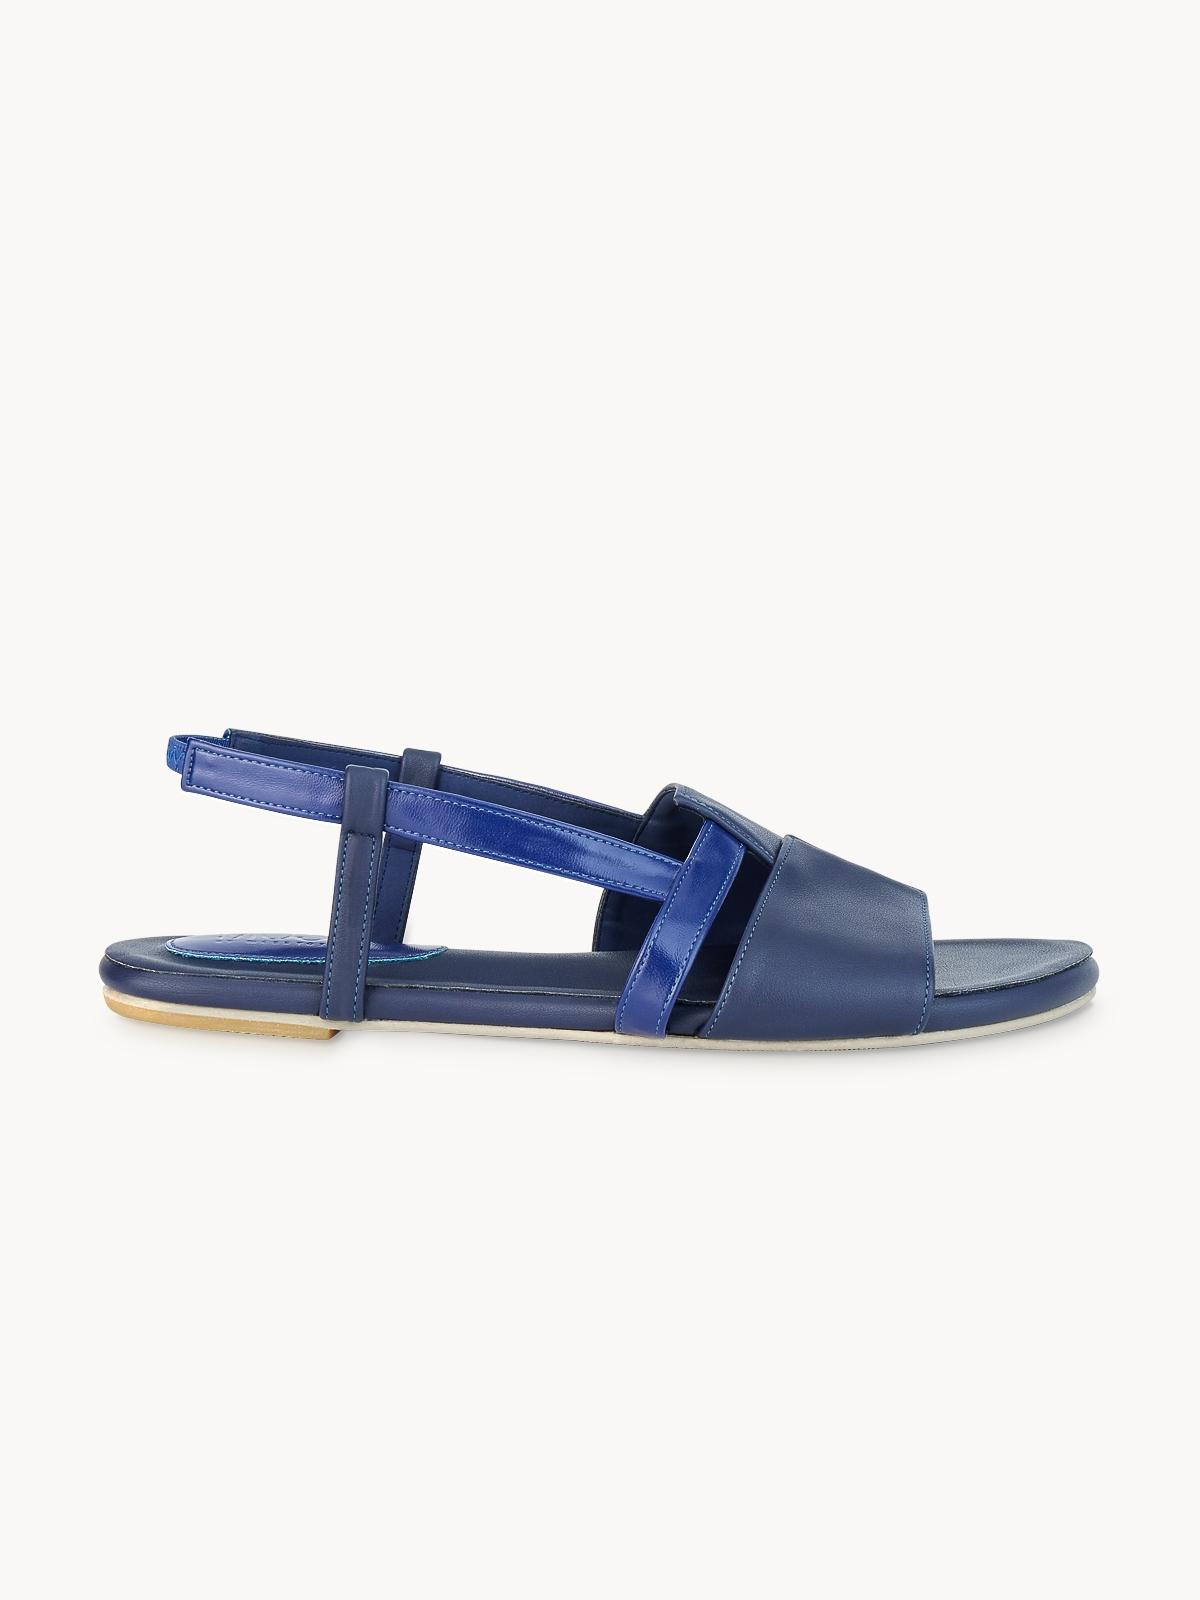 Mosstories Open Toe Flat Sandals Dark Blue